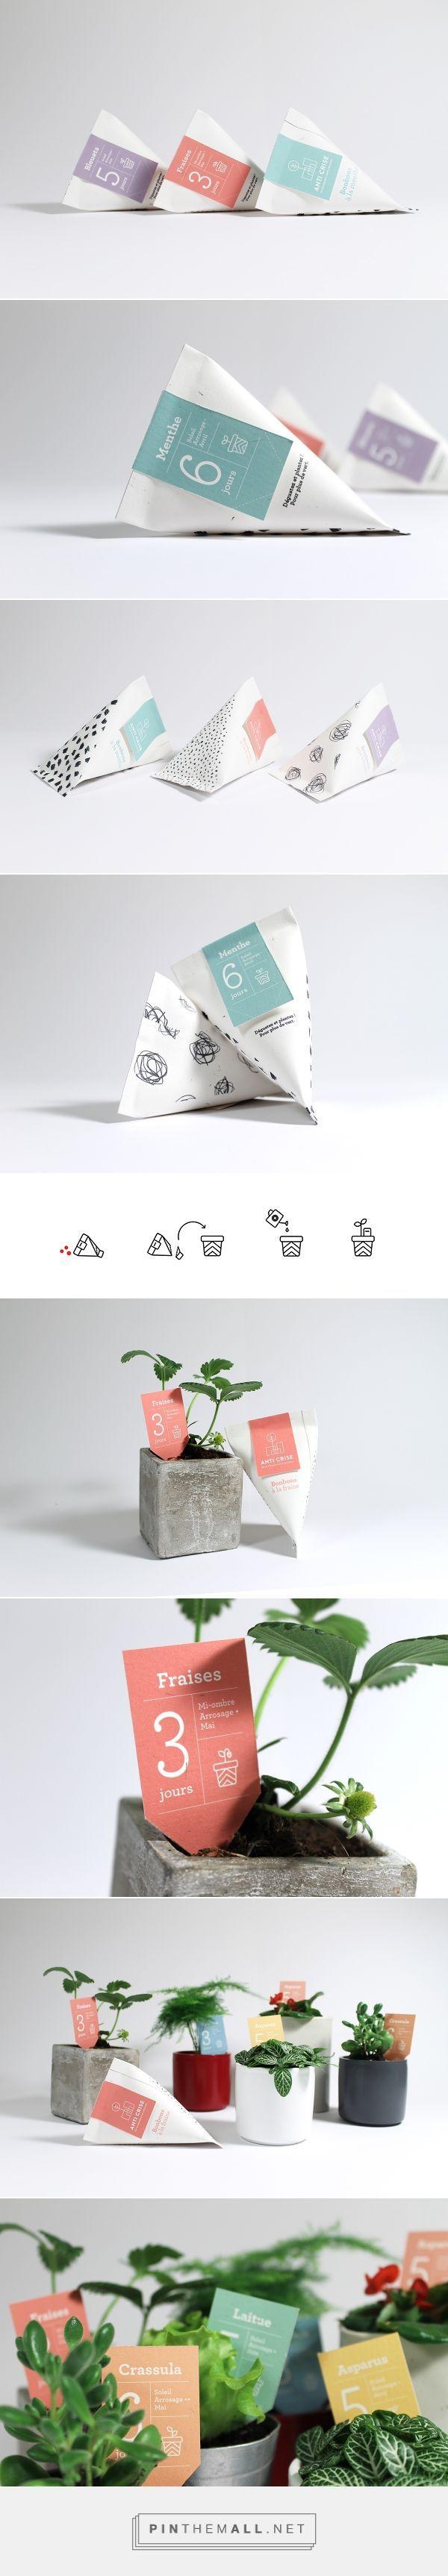 Anticrise seeds for indoor #gardening designed by Julie Ferrieux. #packaging #design